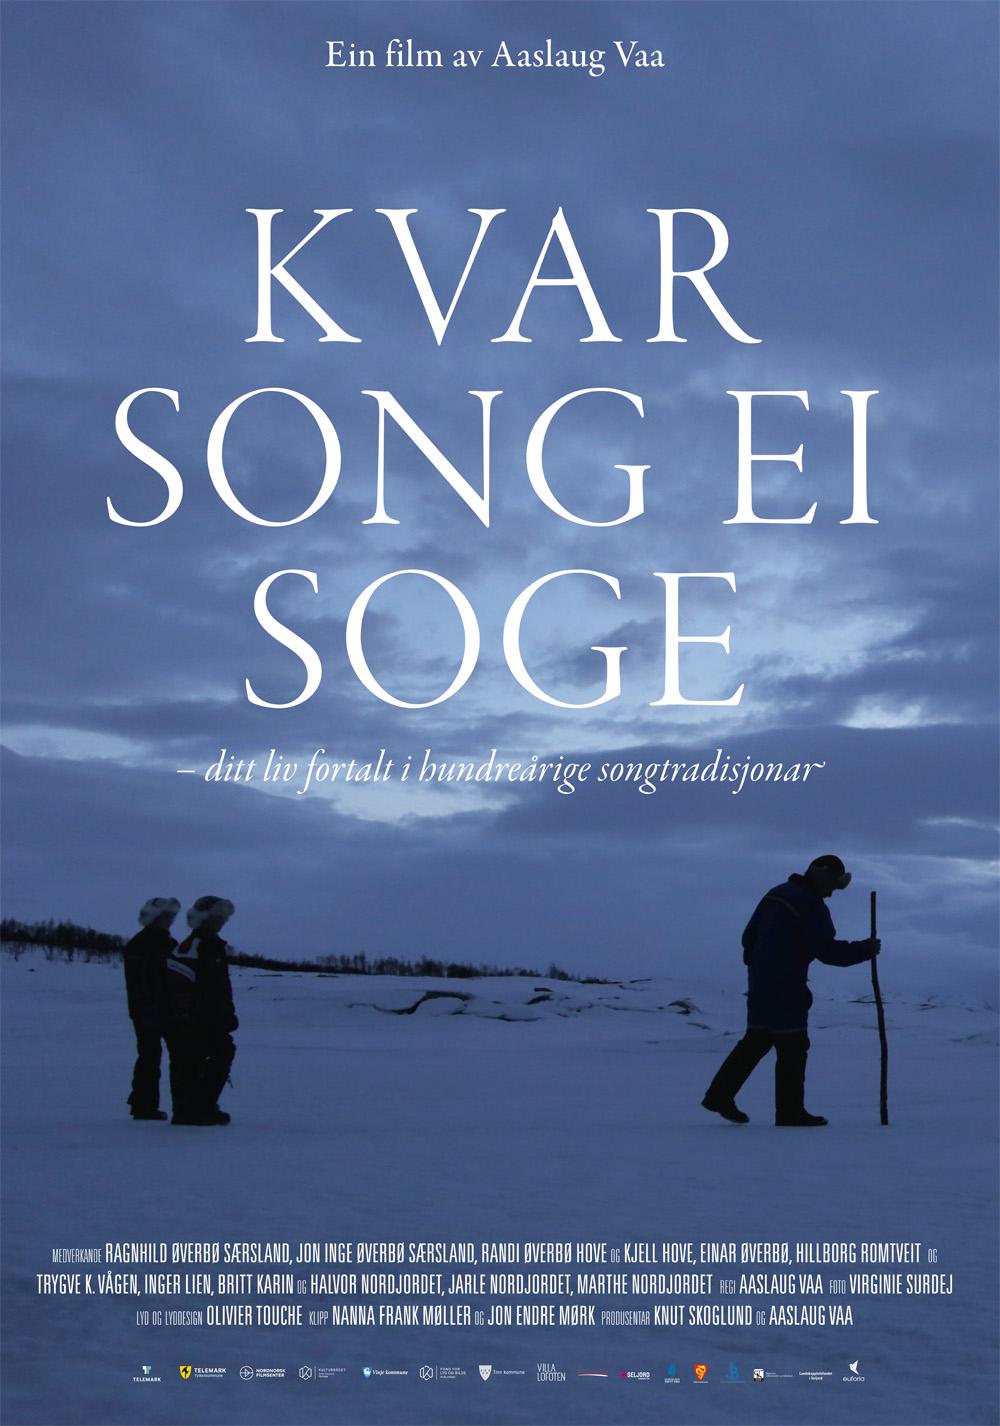 «Kvar song ei soge» – plakat